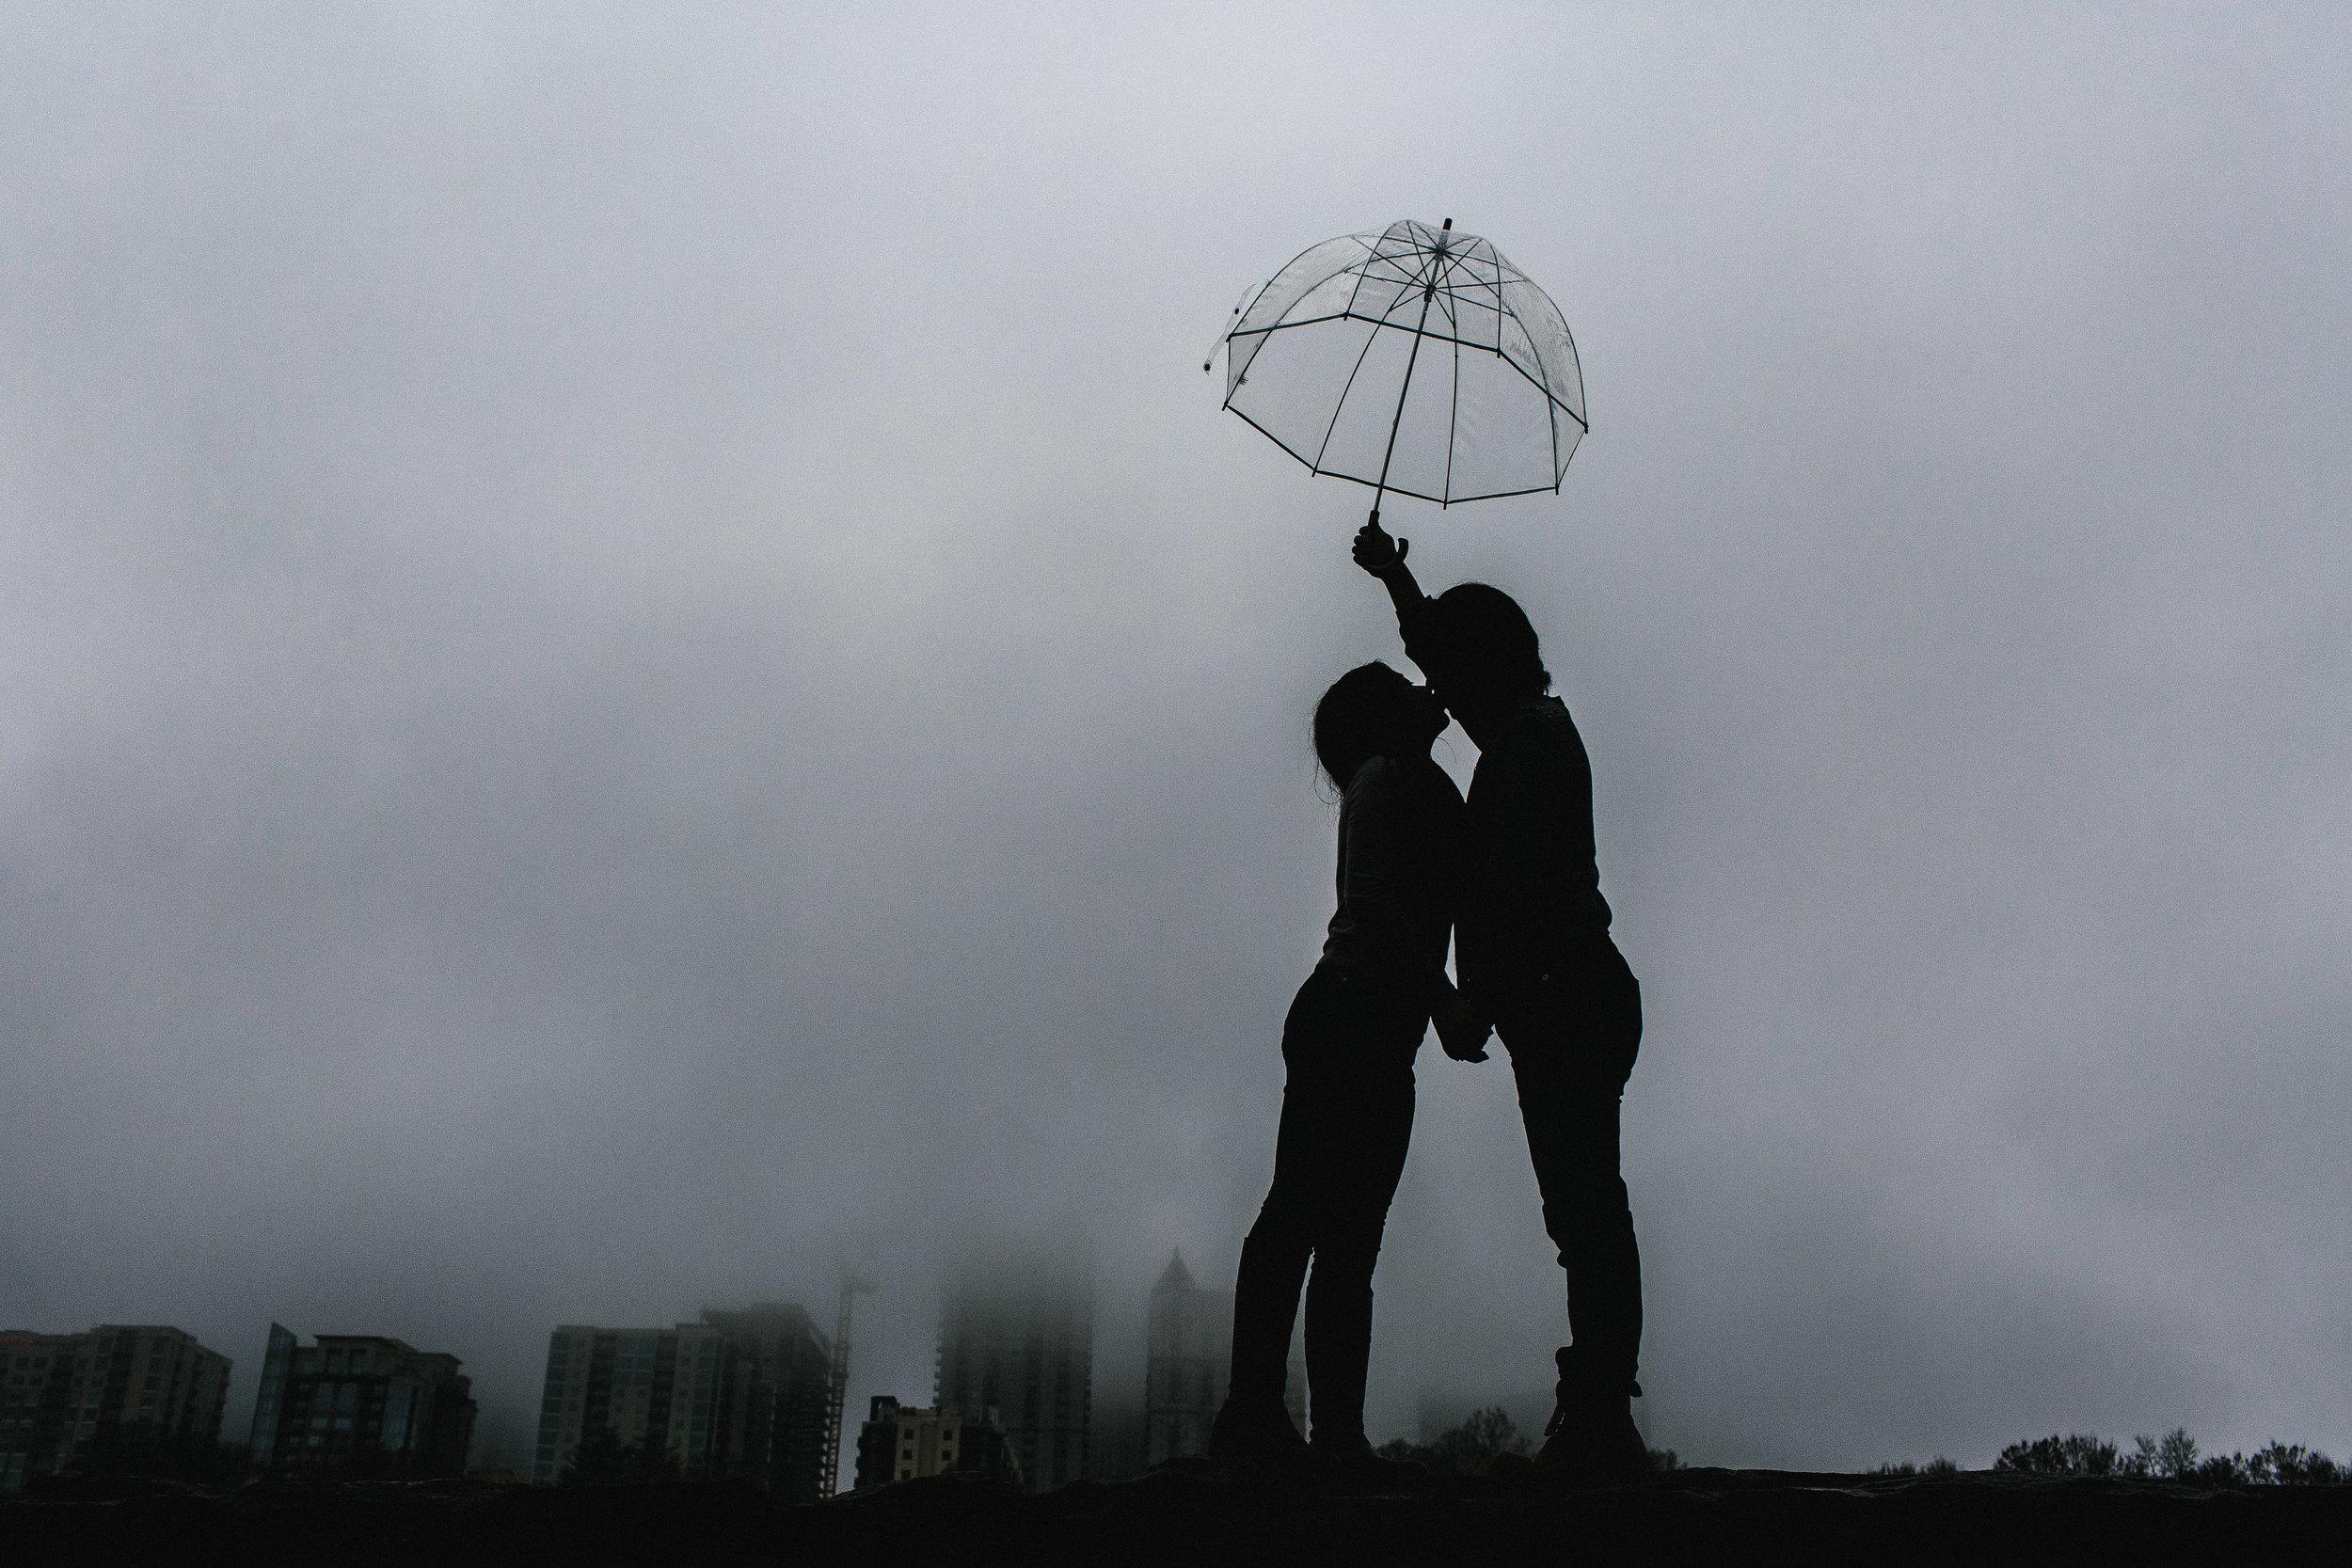 atlanta_gloomy_day_rainy_engagement_couple_lifestyle_fun_playful_artistic_georgia_photographer_2103.jpg